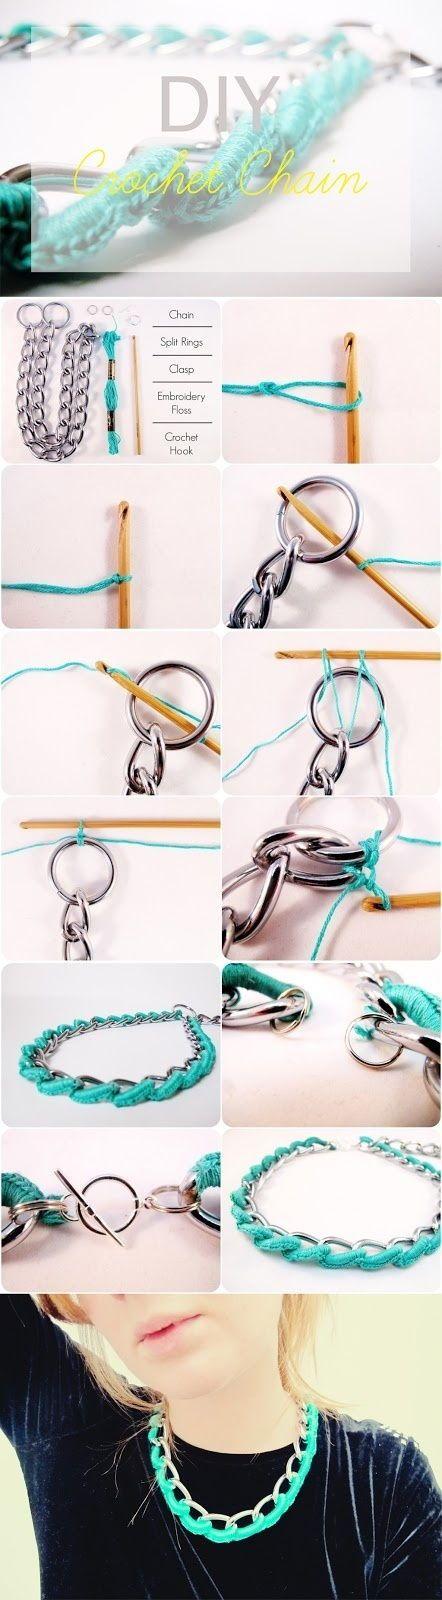 DIY Crochet Chain